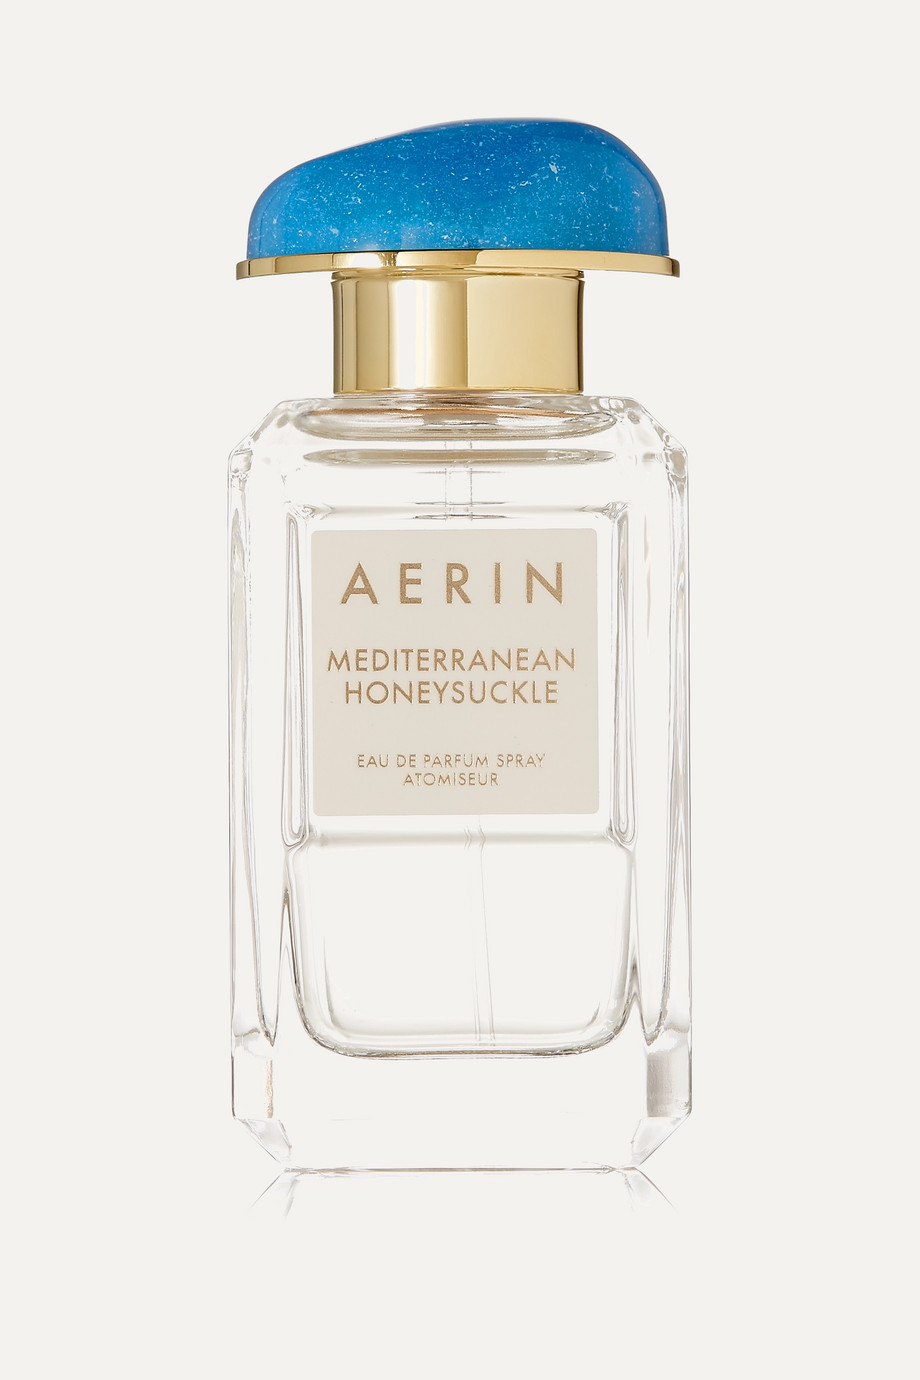 AERIN Beauty Mediterranean Honeysuckle Eau de Parfum, 50ml